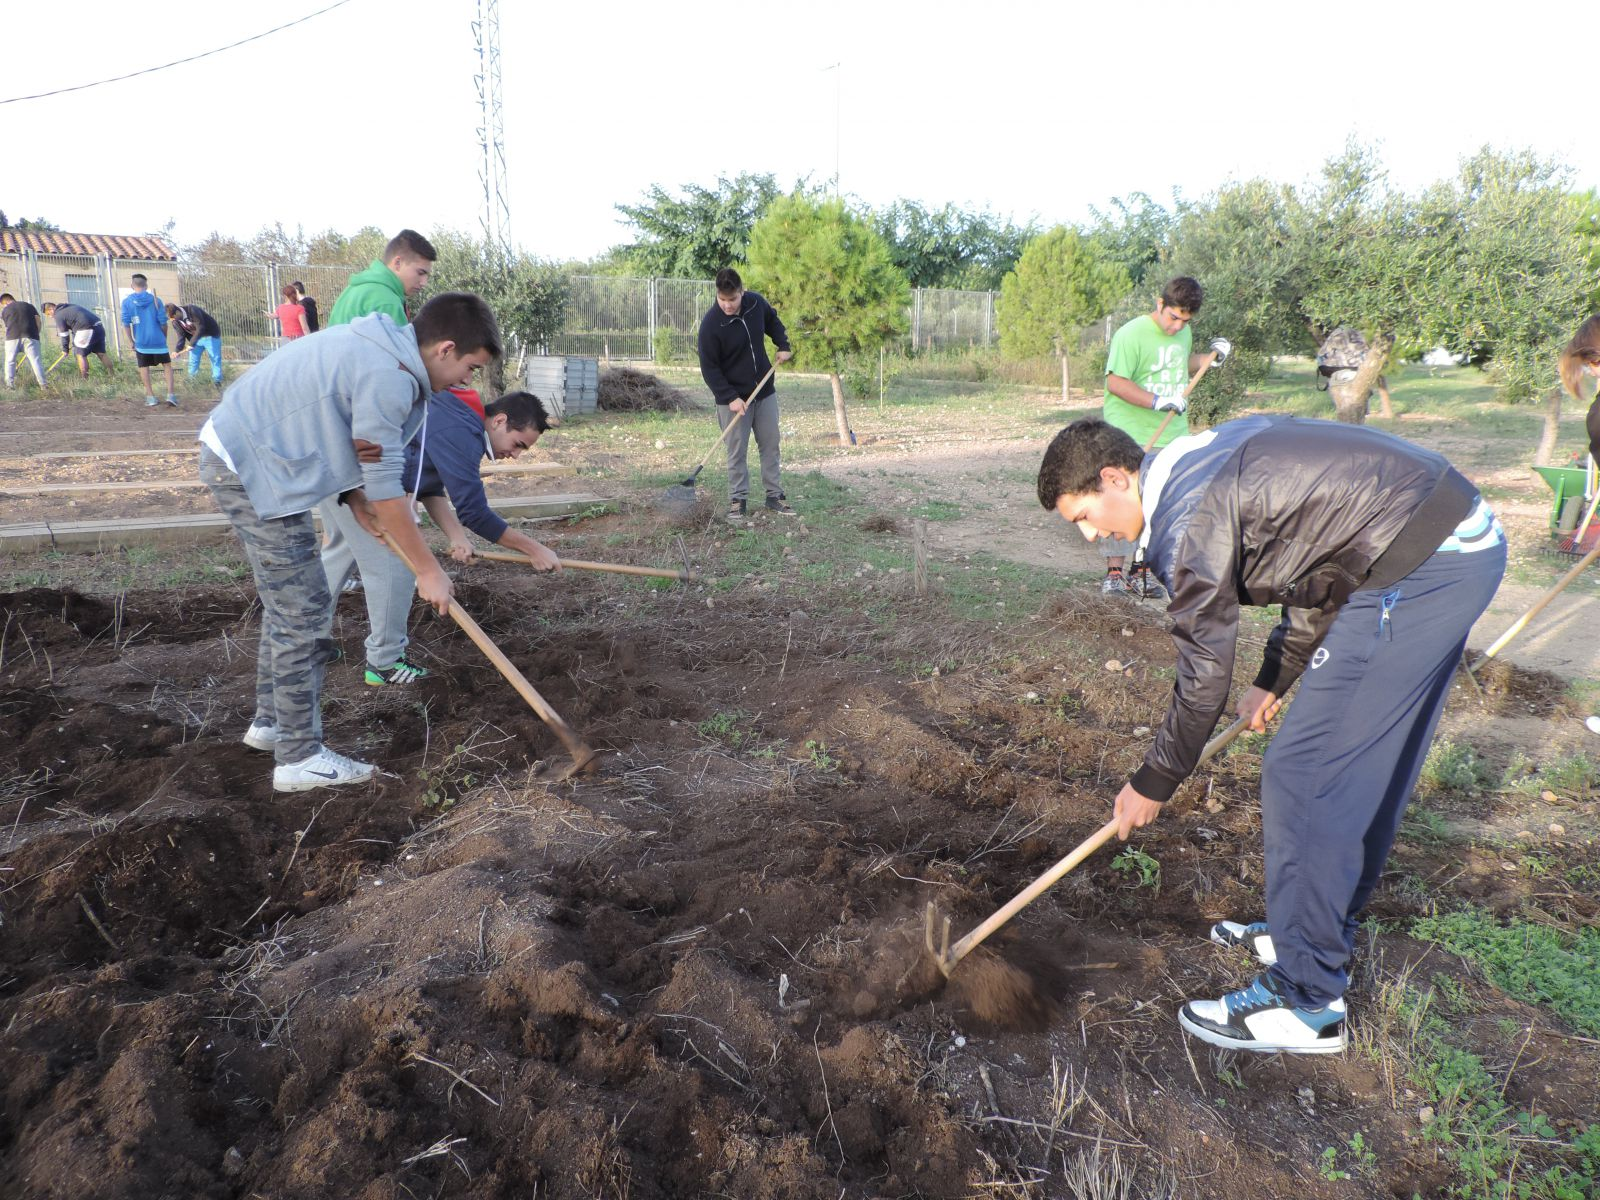 Ptt auxiliar de viveros y jardines ajuntament de mont for Viveros y jardines